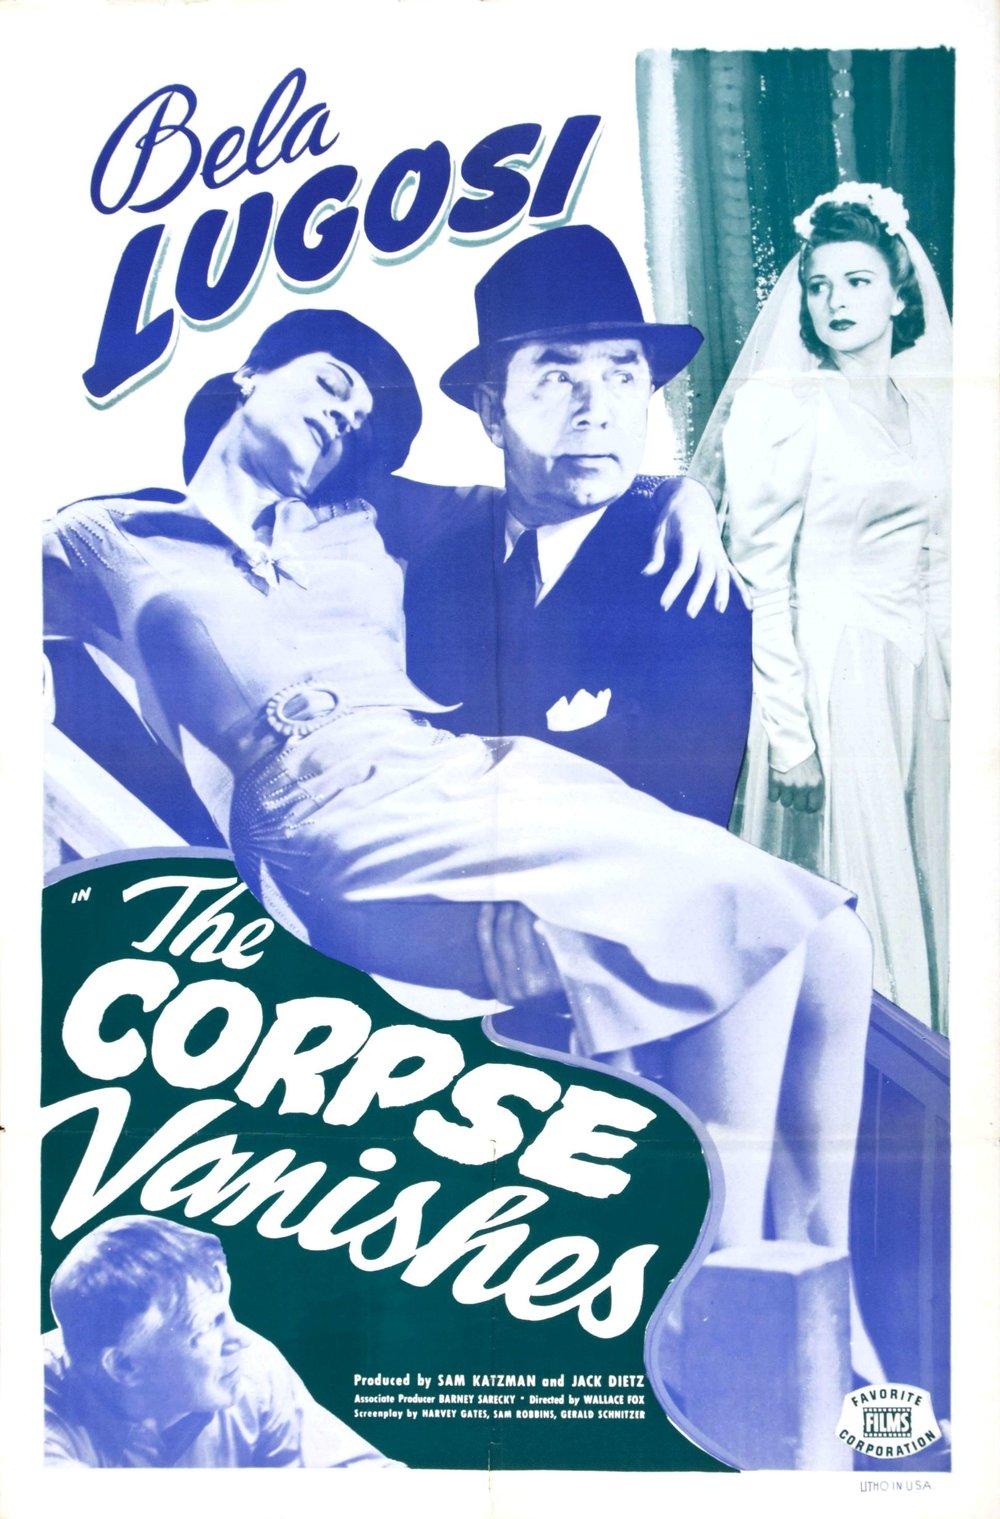 corpse_vanishes_poster_02.jpg